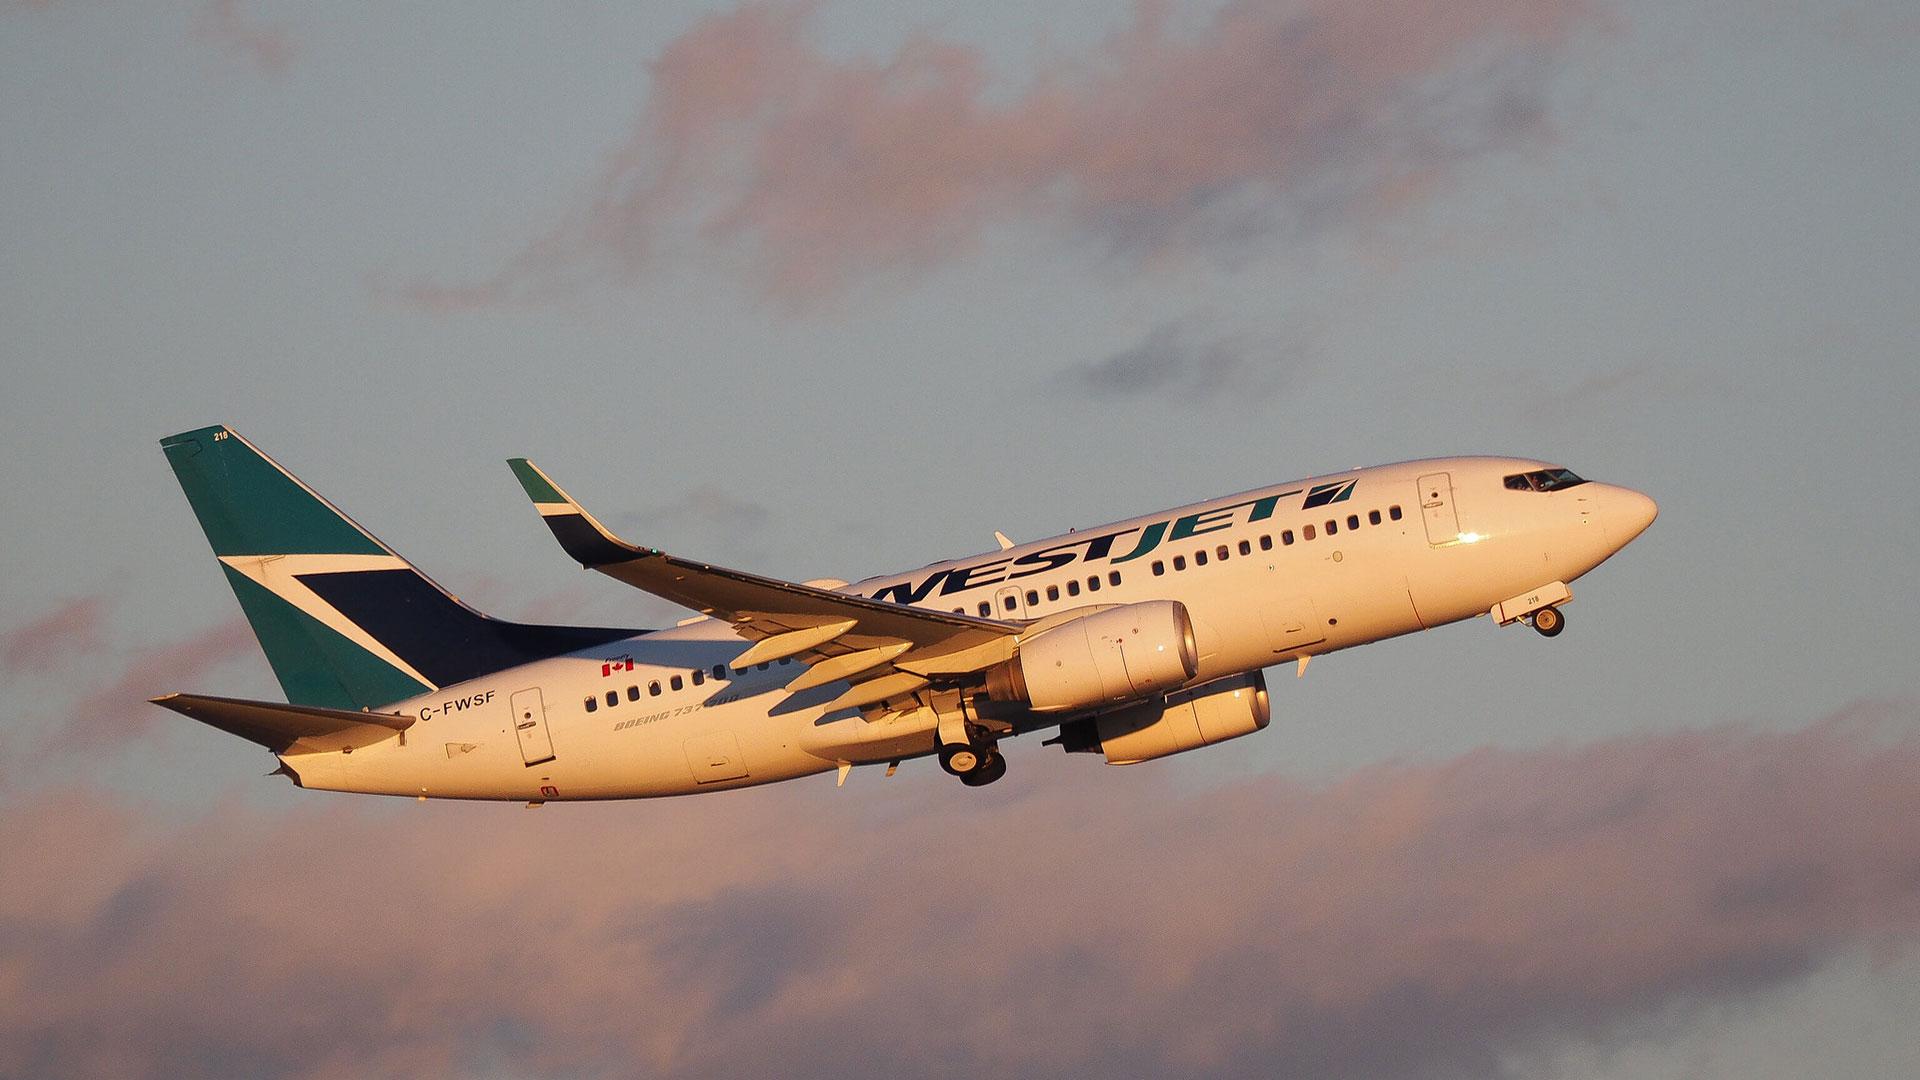 Westjet Airlines Flight tracker